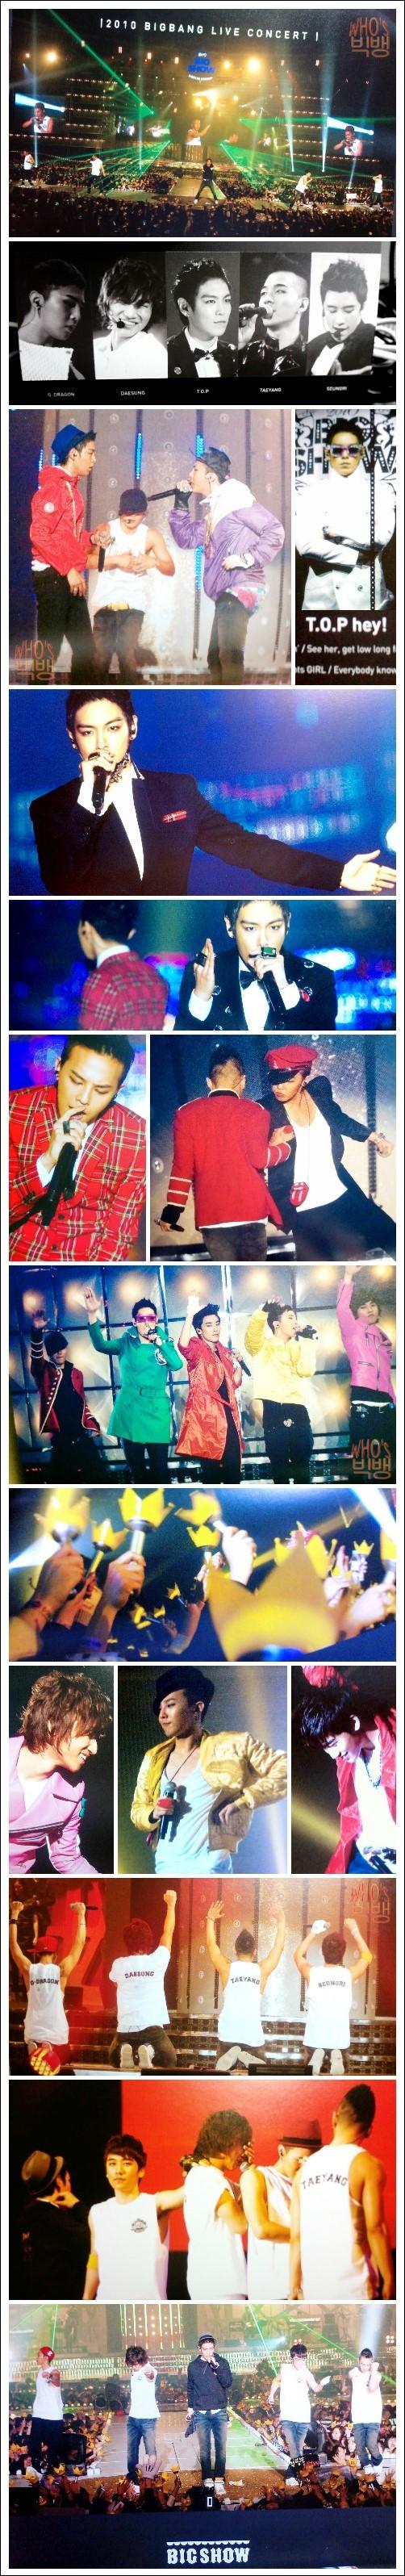 2010 BIGSHOW DVD 03.jpg